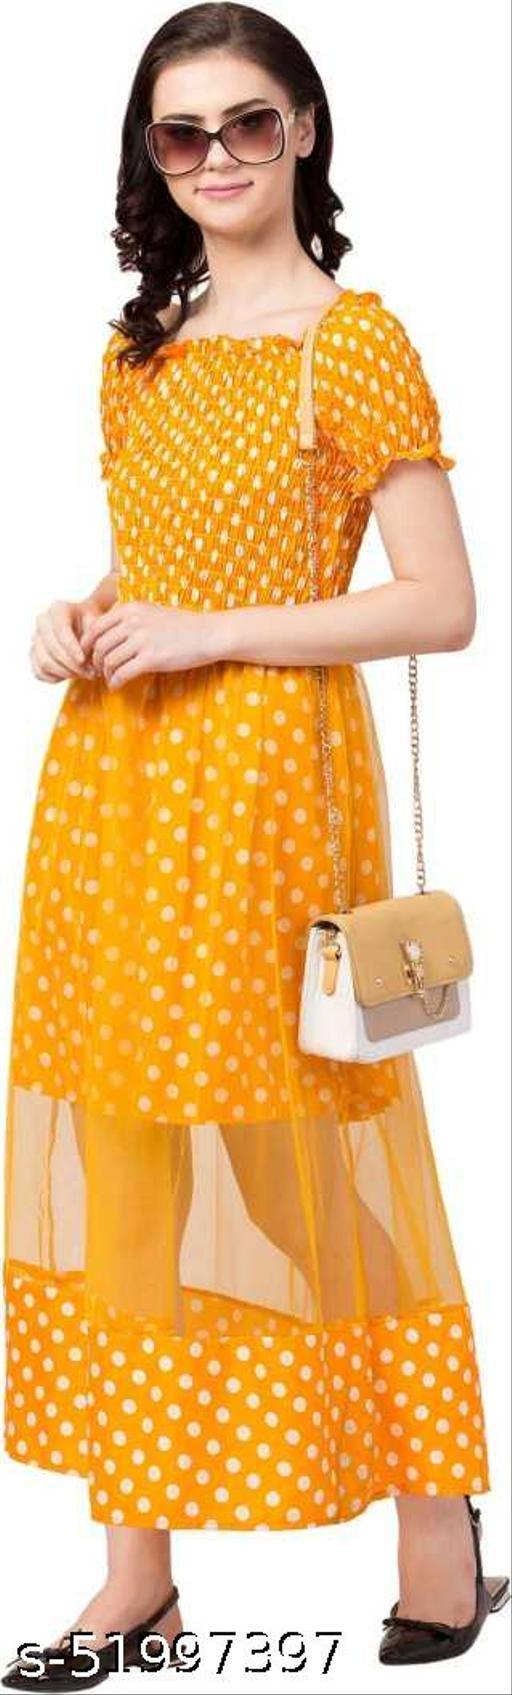 NA GROOMING HUB Trendy Attractive Polka Dot Yellow Long Dress